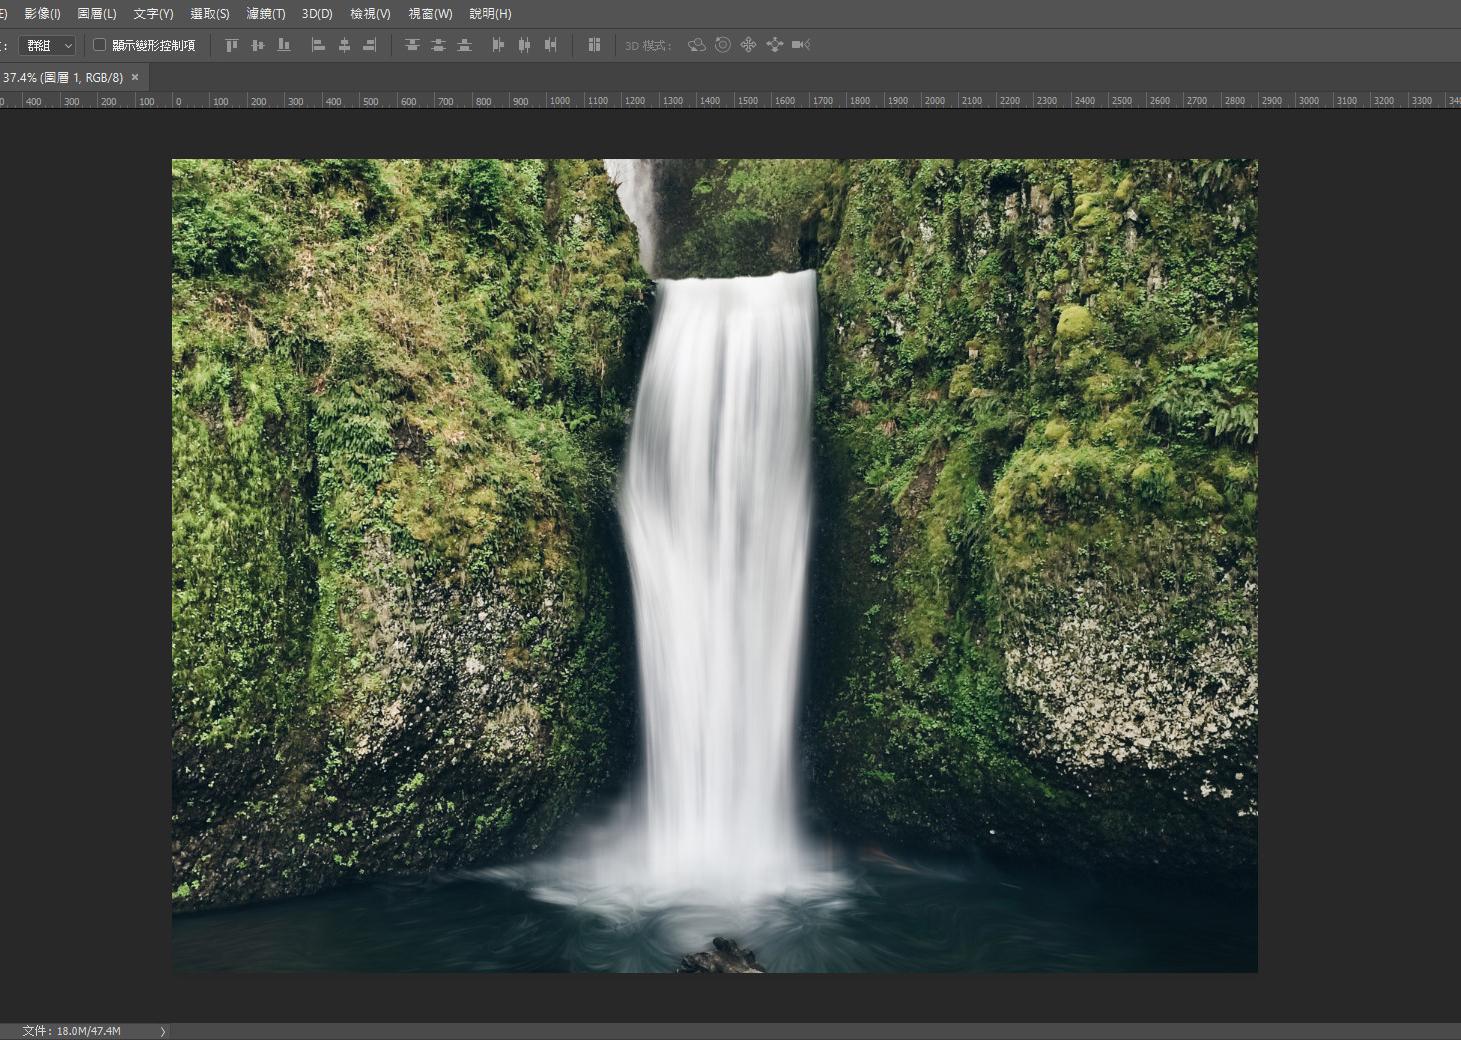 Photoshop - Path Blur Tool (19)